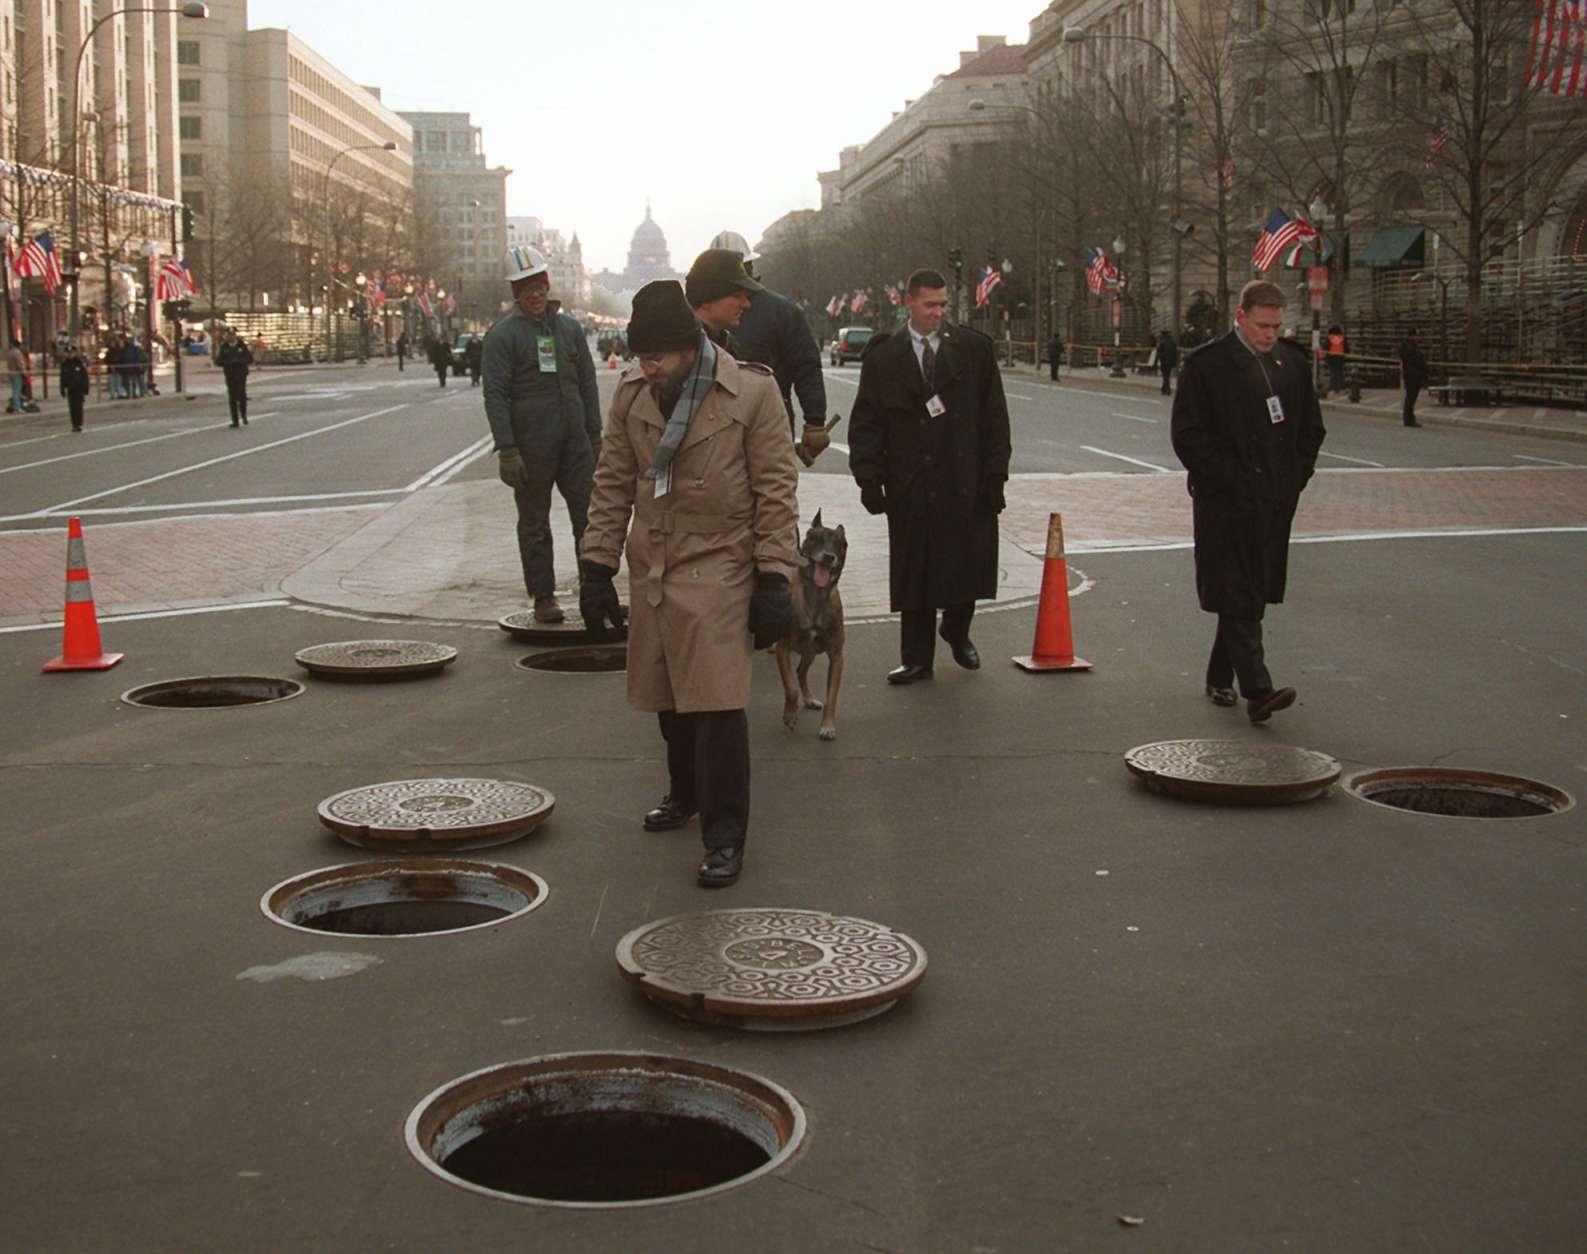 U.S. Secret Service agents check manholes on Pennsylvania Avenue in Washington Monday Jan. 20, 1997 in anticipation to President Clinton's inaugural parade. (AP Photo/Mark Wilson)